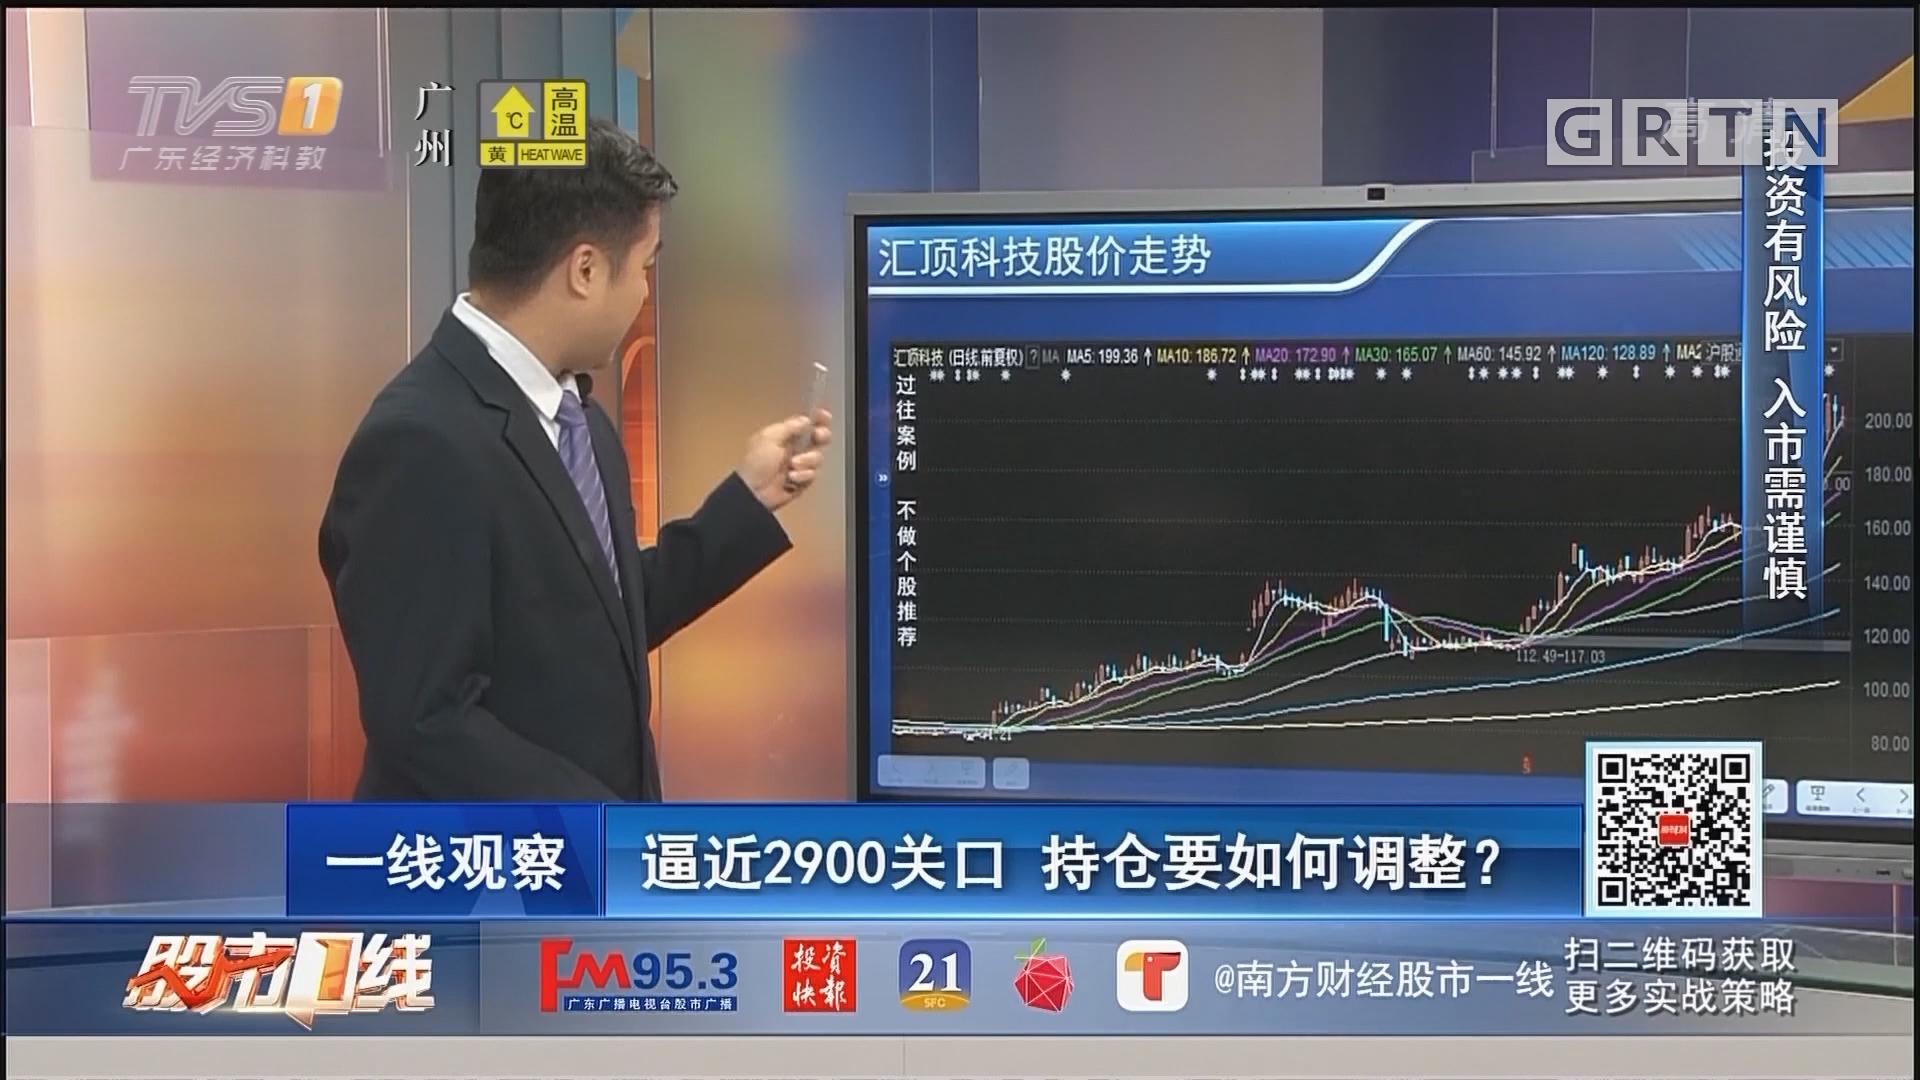 [HD][2019-08-23]股市一线:逼近2900关口 持仓要如何调整?